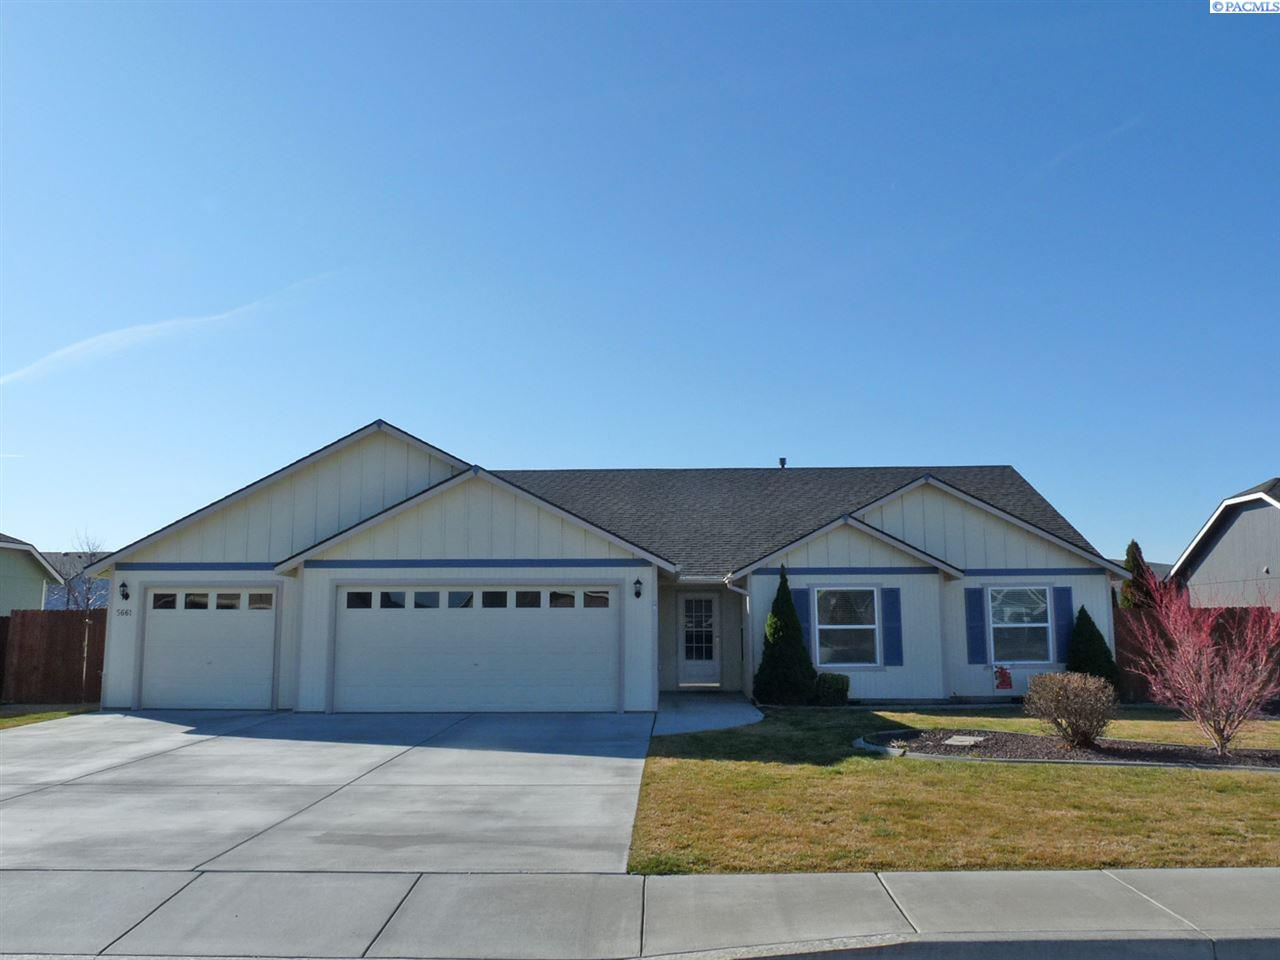 Single Family Home for Sale at 5661 Leilani Drive 5661 Leilani Drive West Richland, Washington 99353 United States